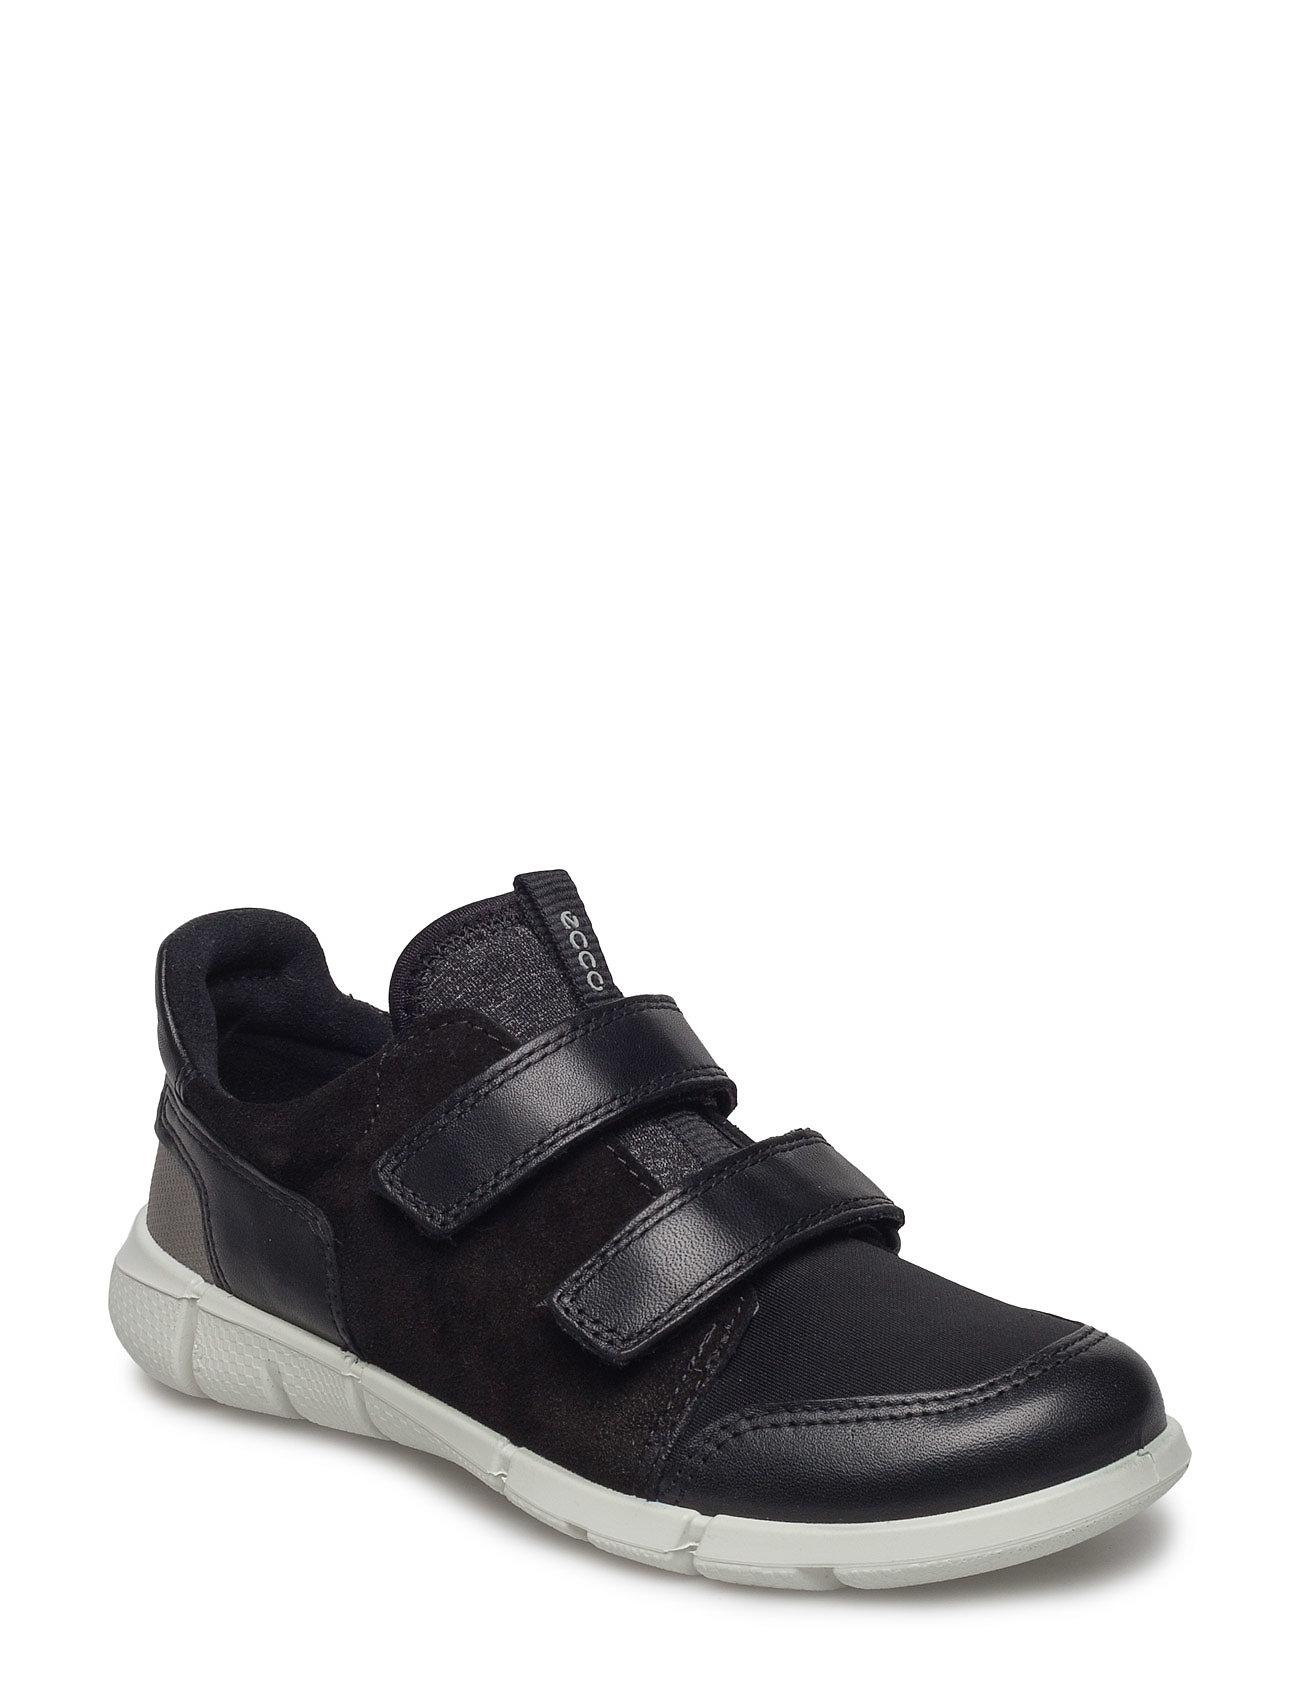 ecco – Intrinsic sneaker på boozt.com dk